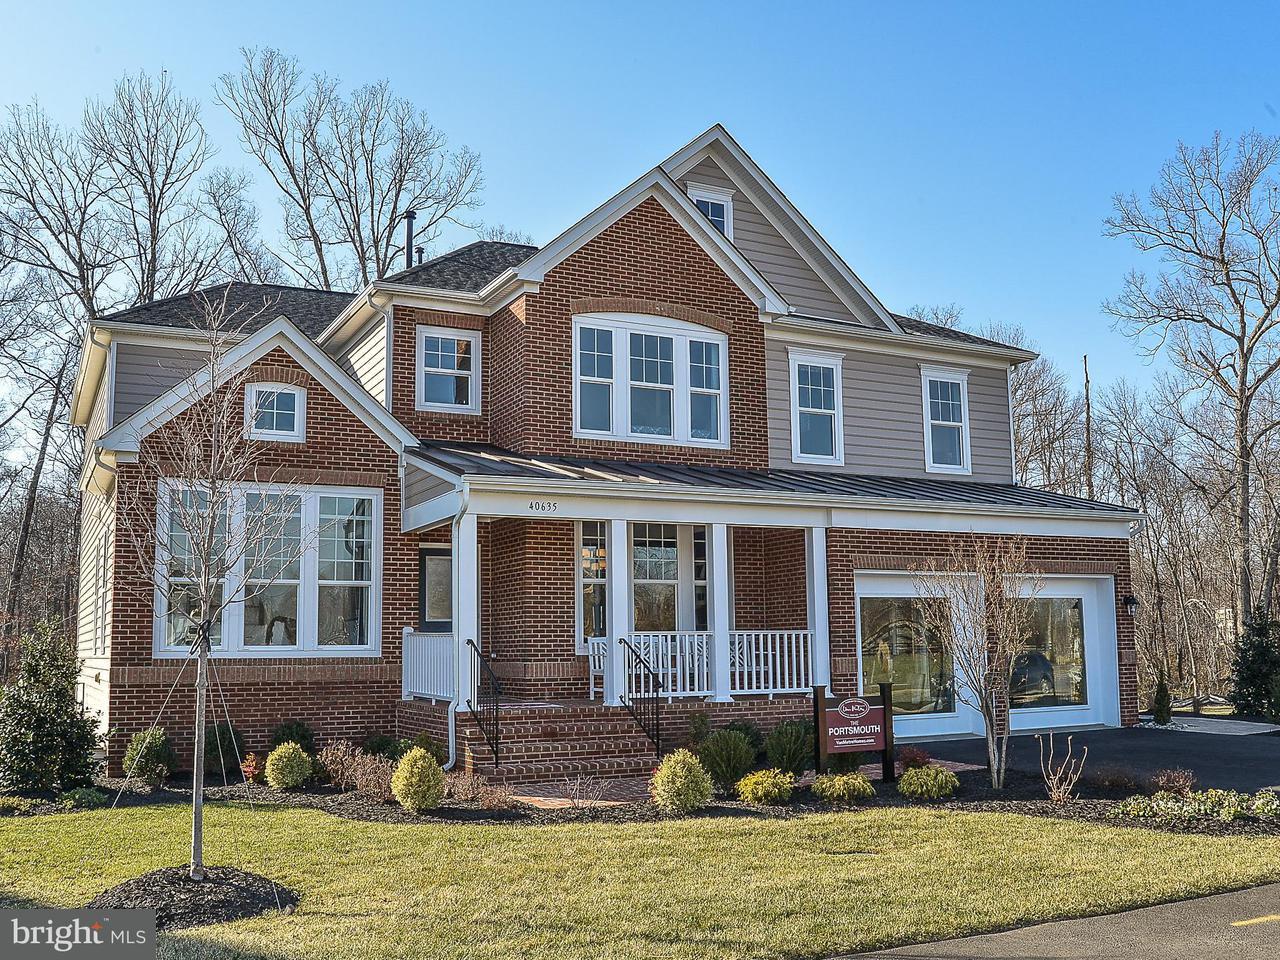 Single Family Home for Sale at 42302 STONEMONT CIR E 42302 STONEMONT CIR E Brambleton, Virginia 20148 United States